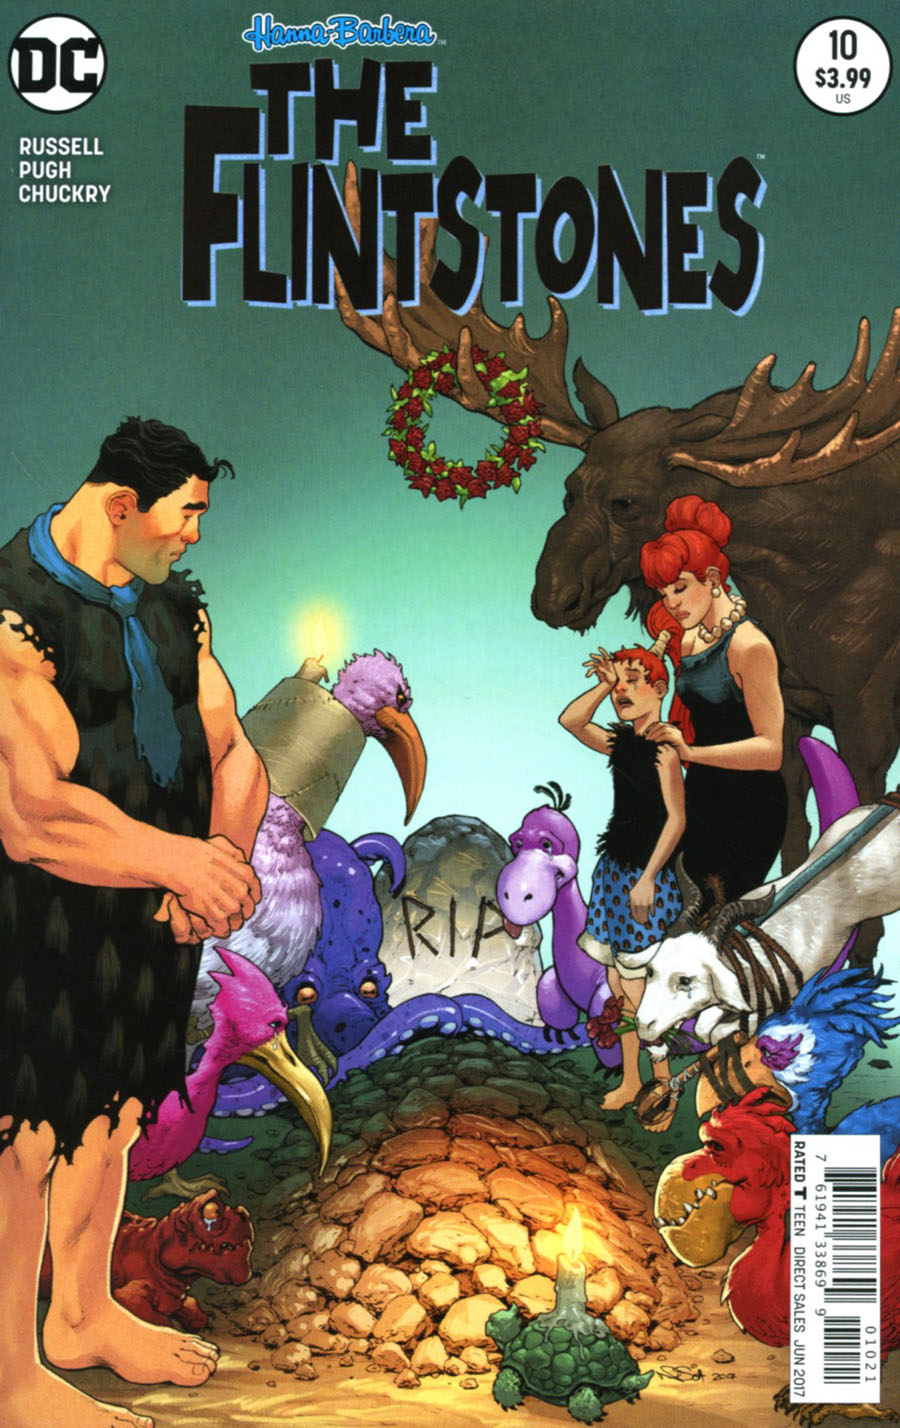 Flintstones (DC) #10 Cover B Variant Nicola Scott Cover